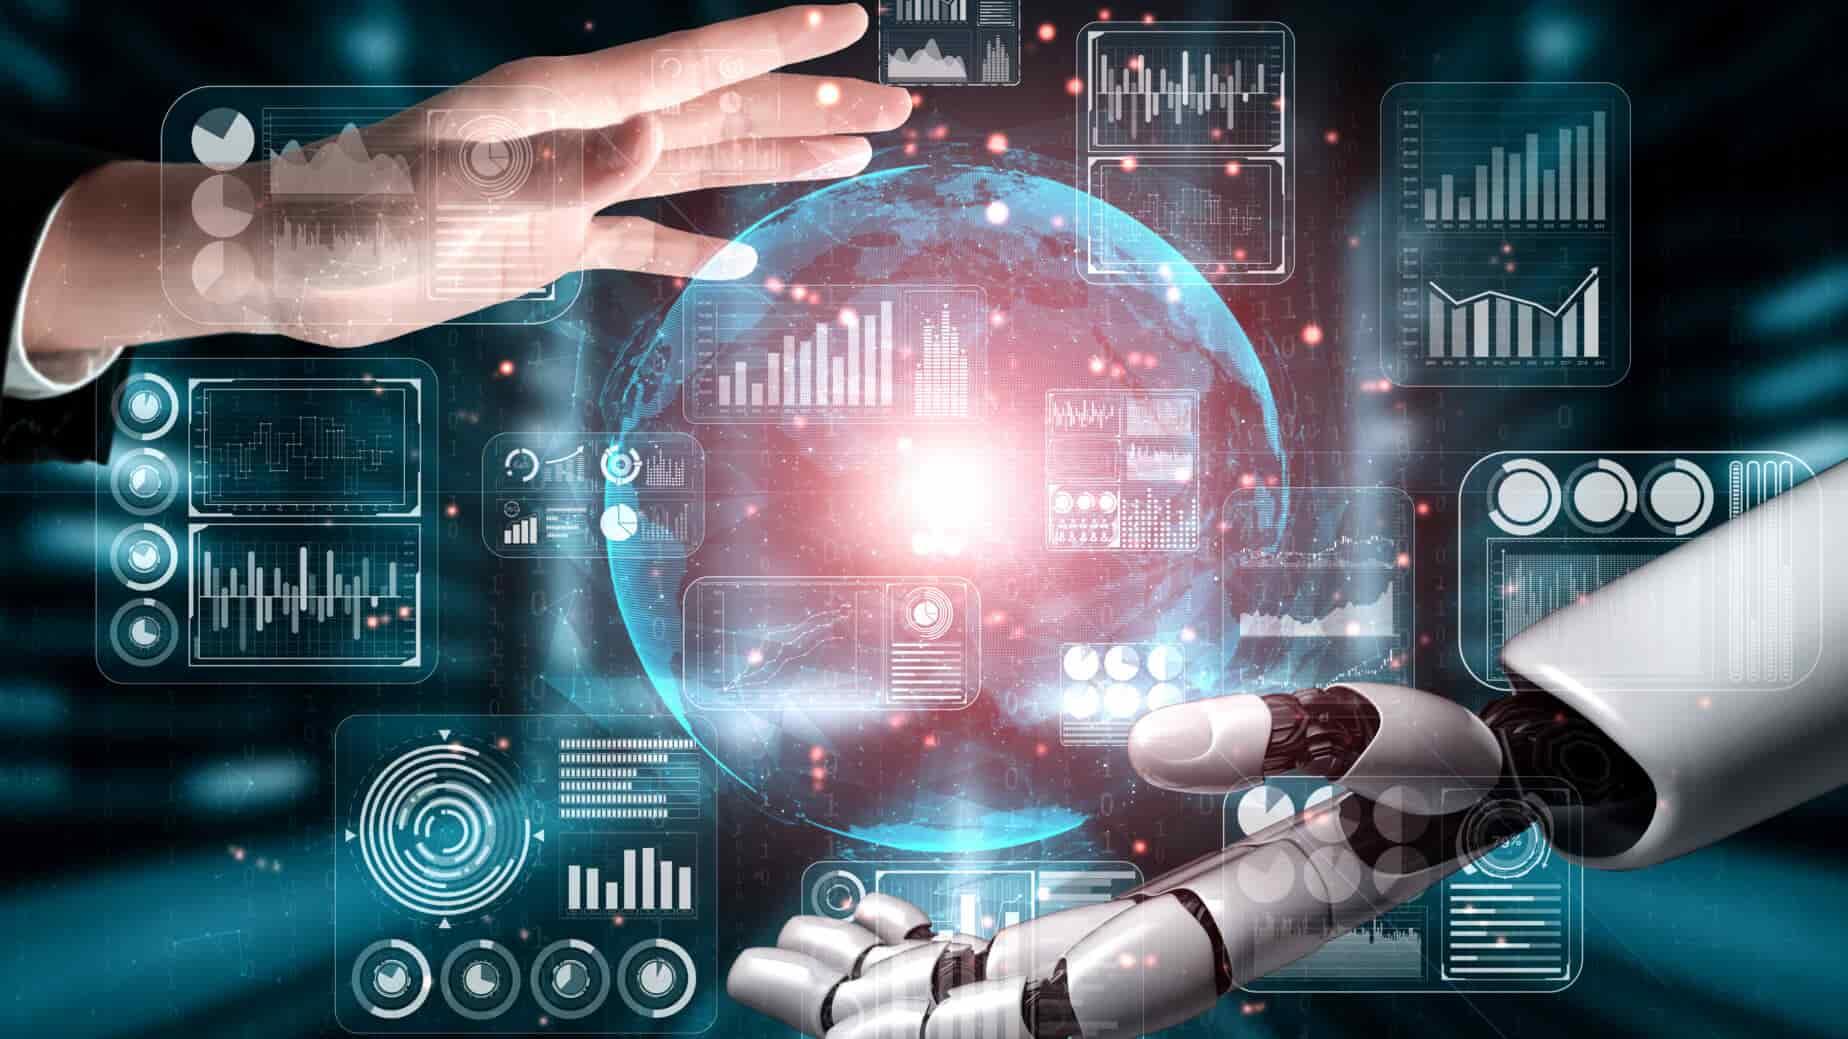 AI時代,即時有意義的專利情報是組織營運不可或缺的智慧